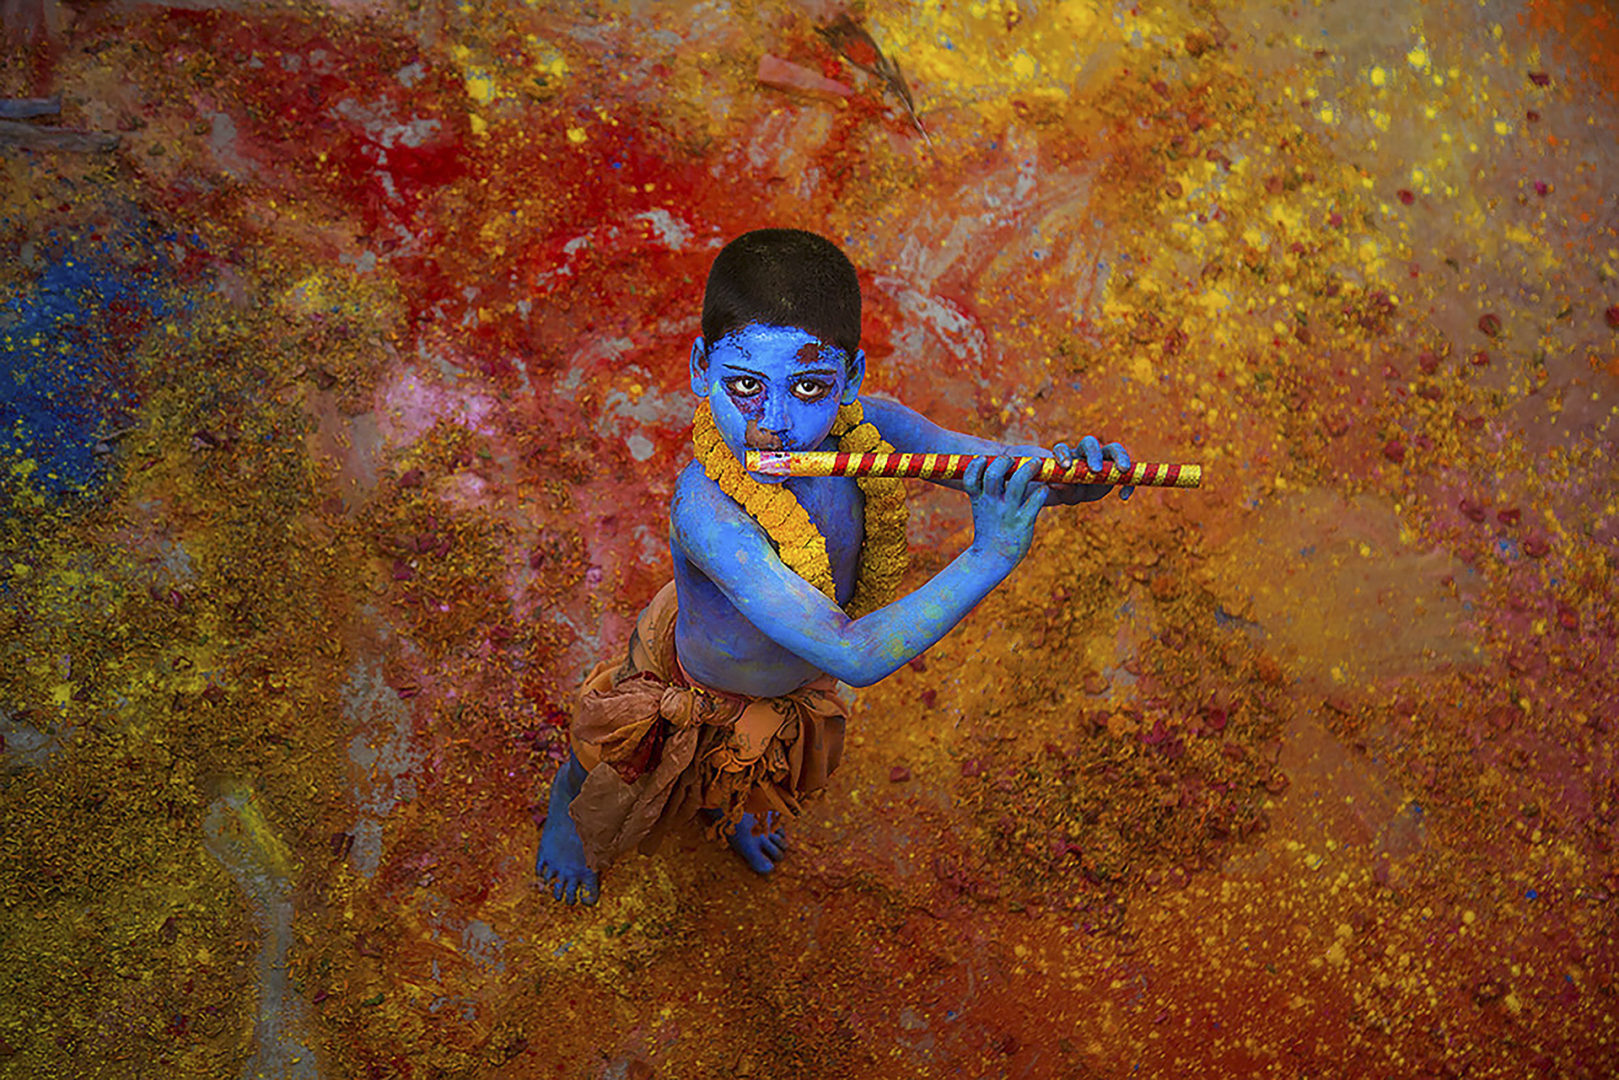 Photographer: Sanghamitra Sarkar